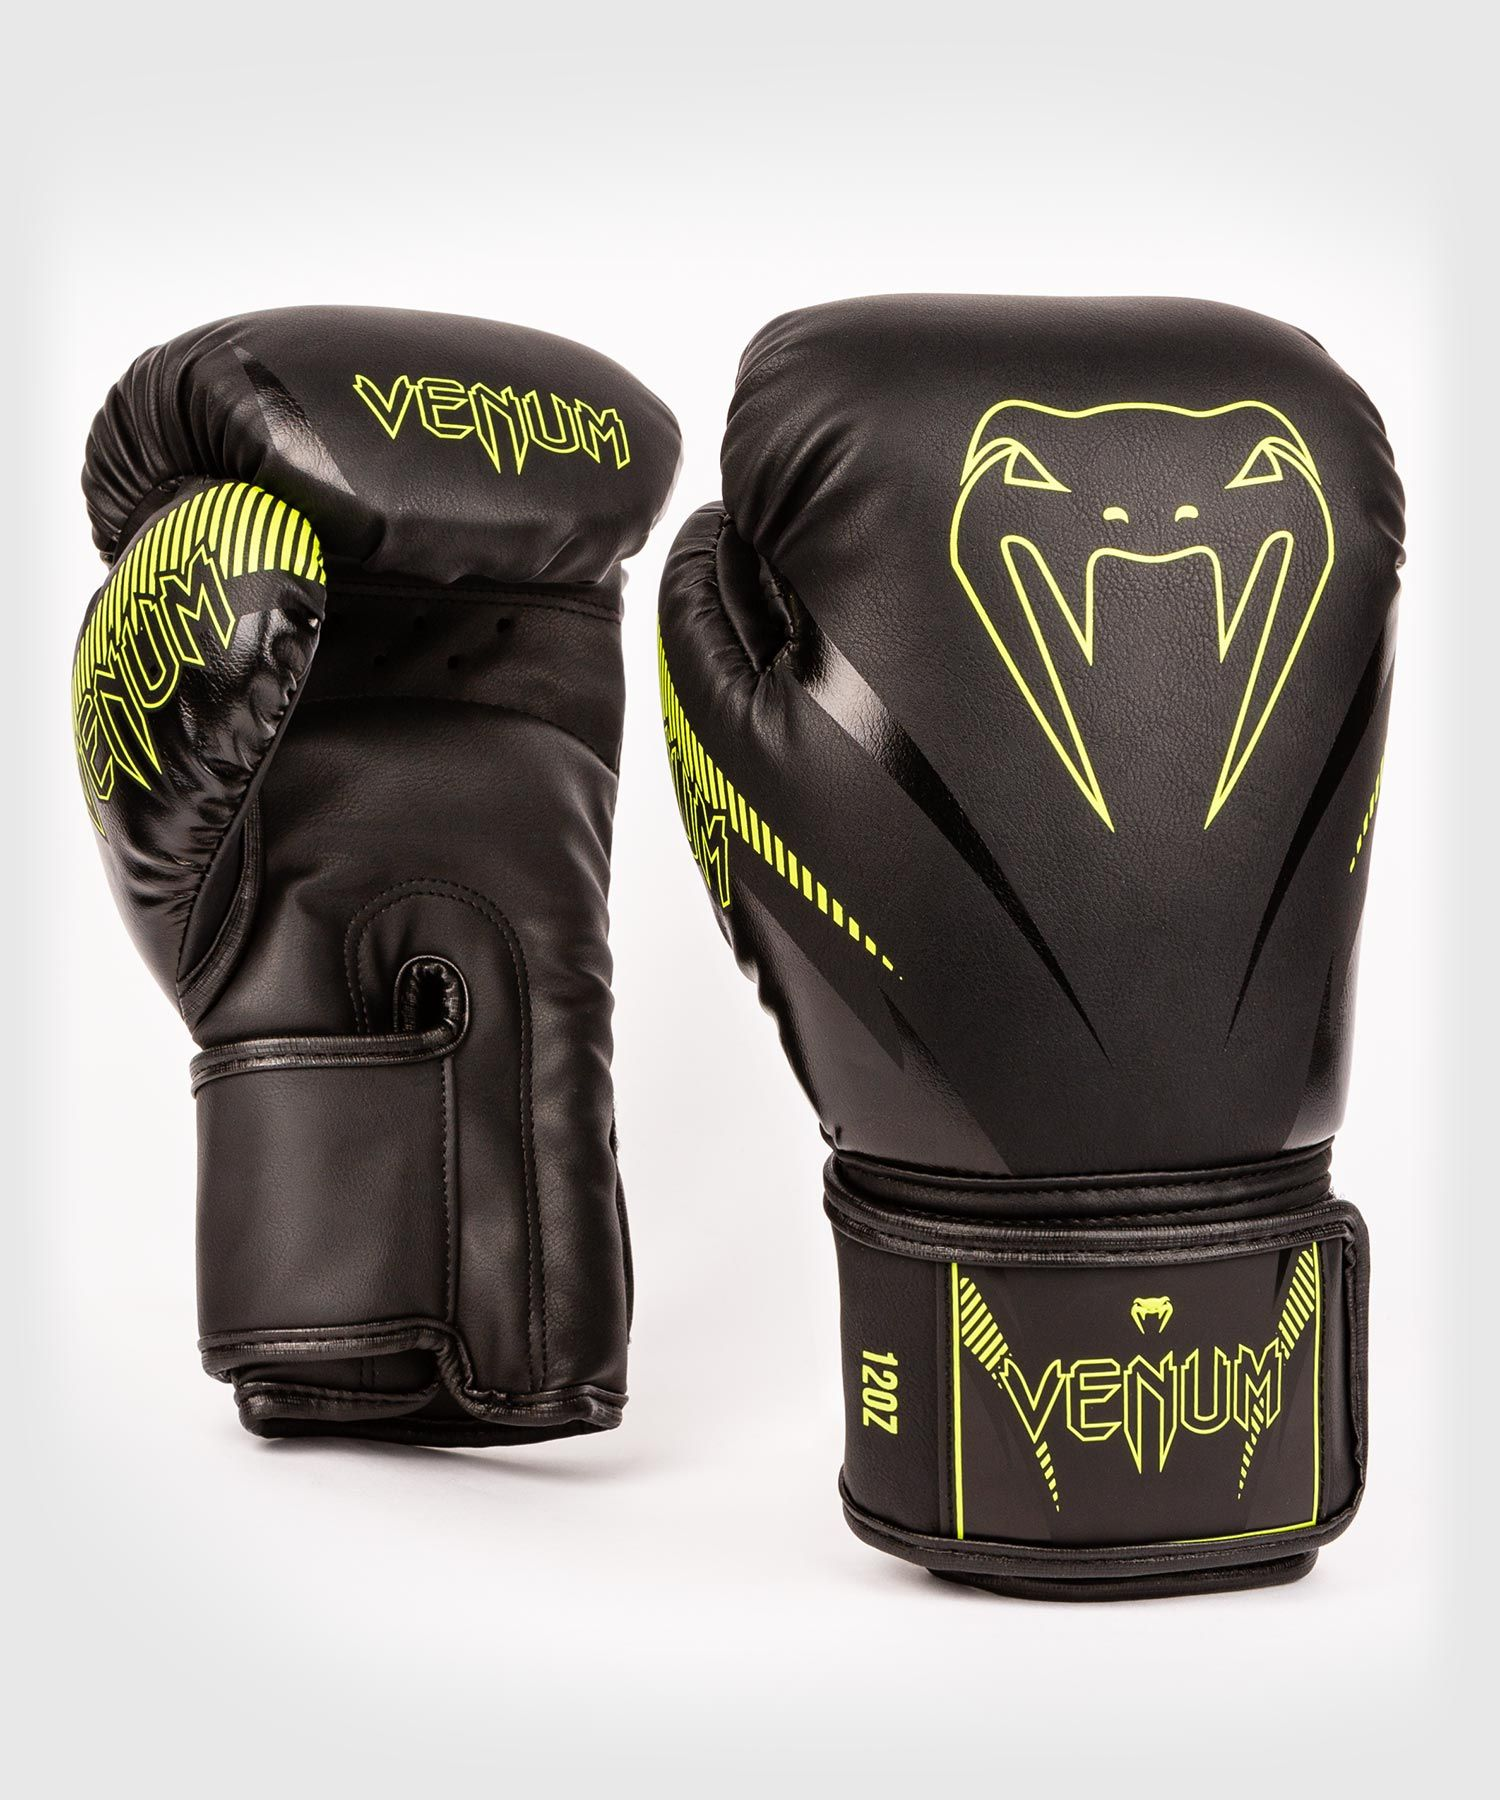 Venum Impact Boxing Gloves - Black/Neo Yellow